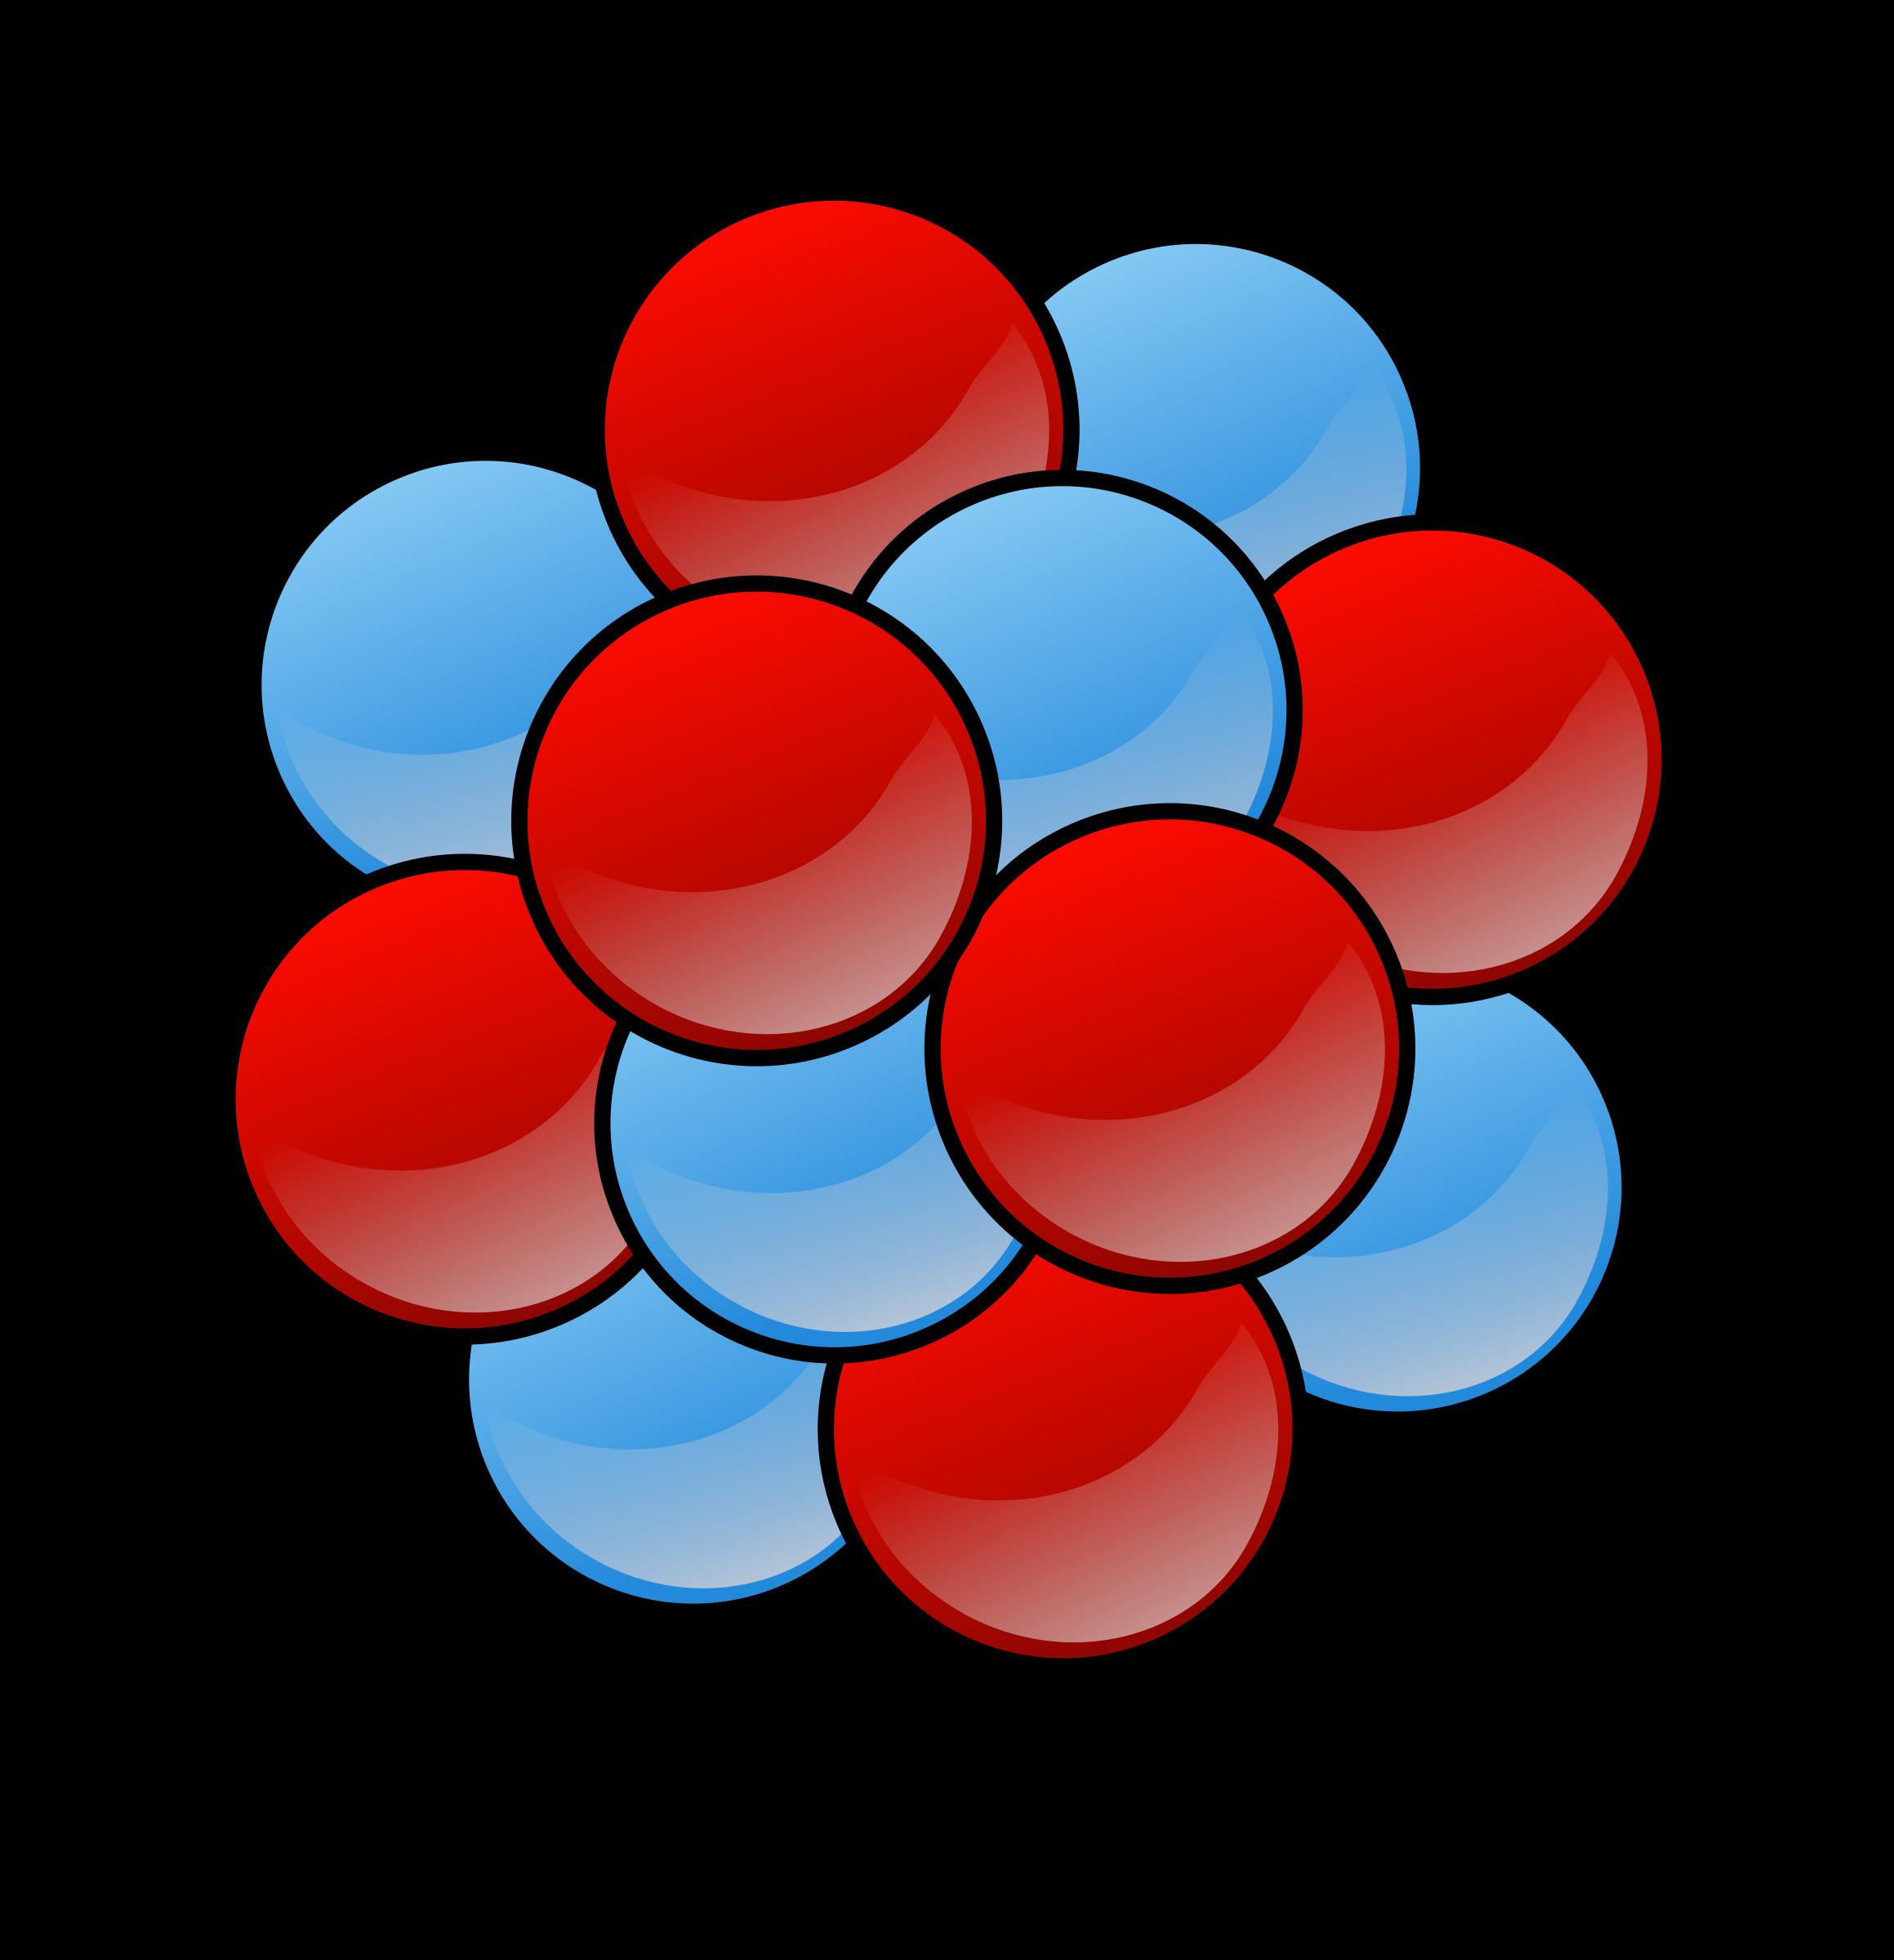 Big image png. Atom clipart carbon atom